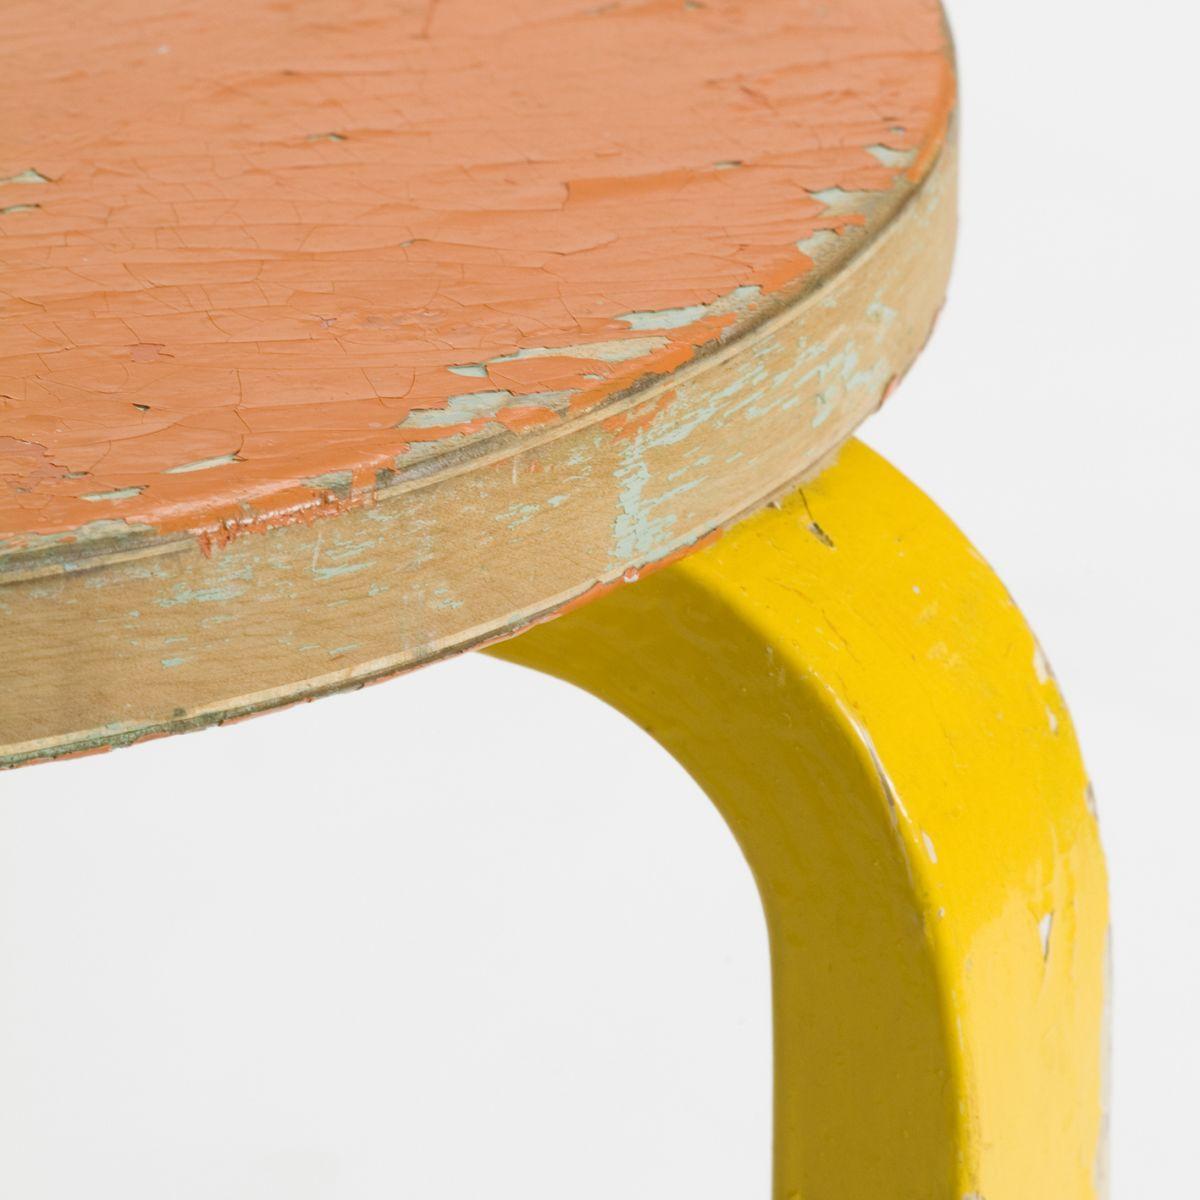 Stool-60-2Nd-Cycle-Close-Orange-Yellow-1844636